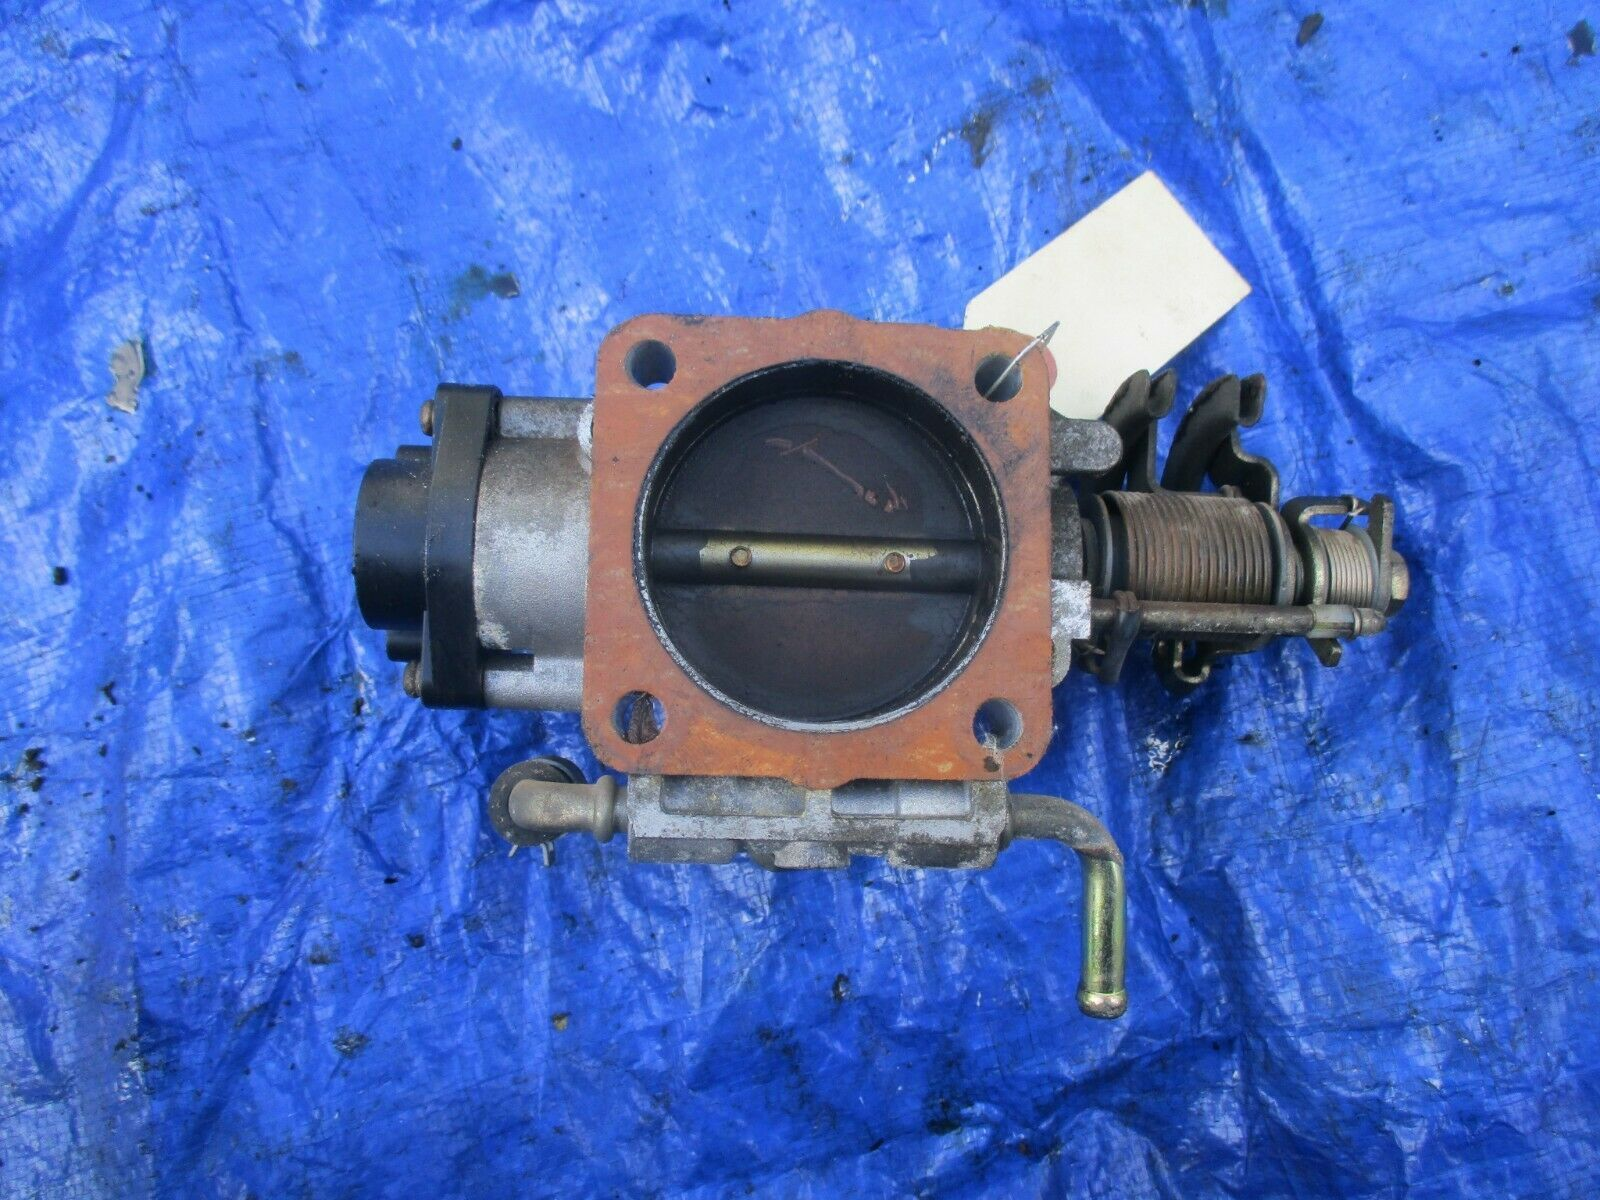 1998 Nissan 200SX SR20 2.0L DOHC throttle body assembly OEM engine motor